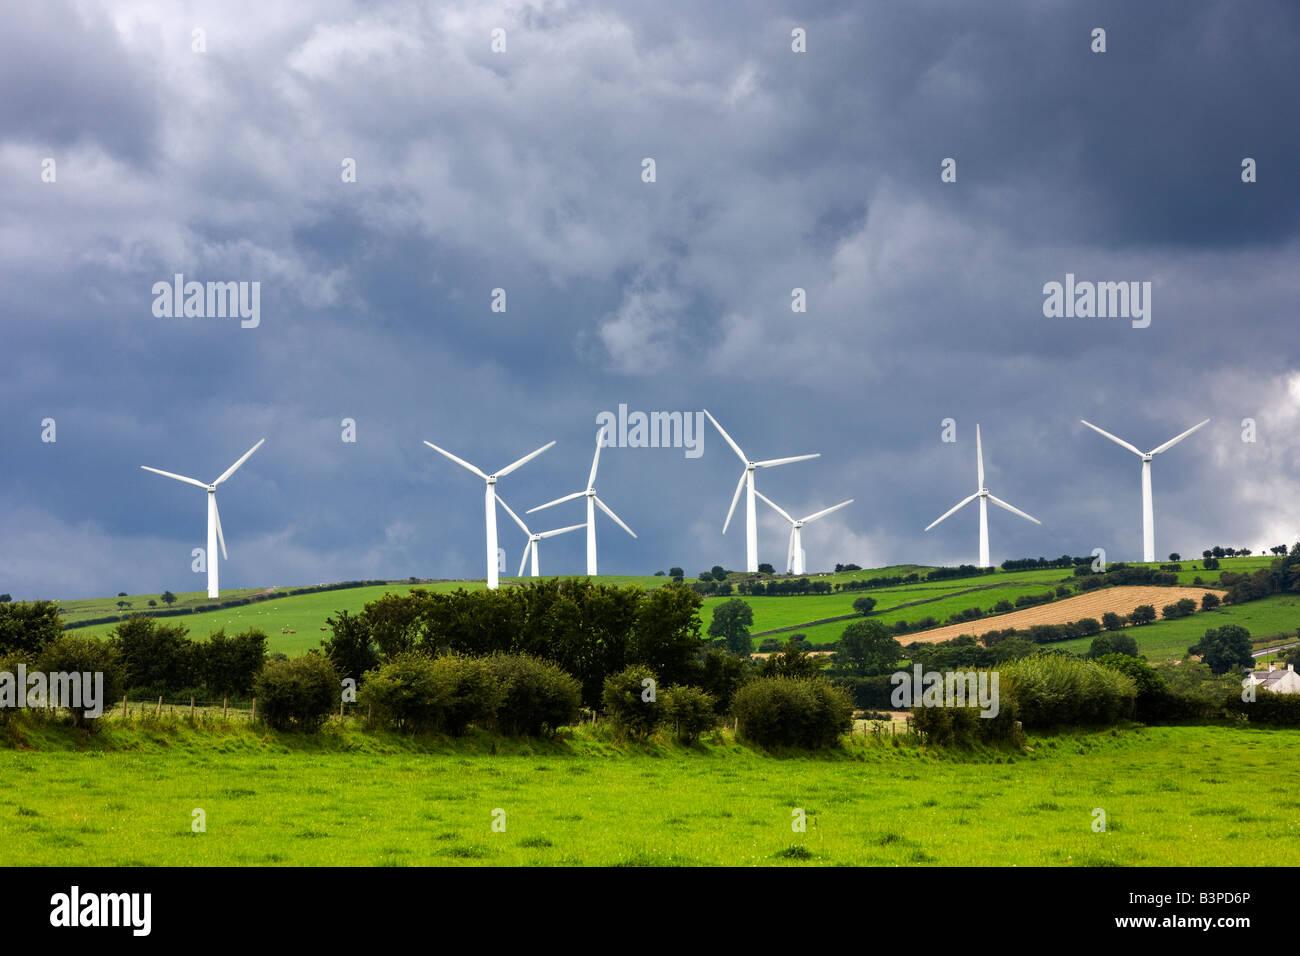 Wind turbine farm at Bothel, Lake District, Cumbria, UK - Stock Image